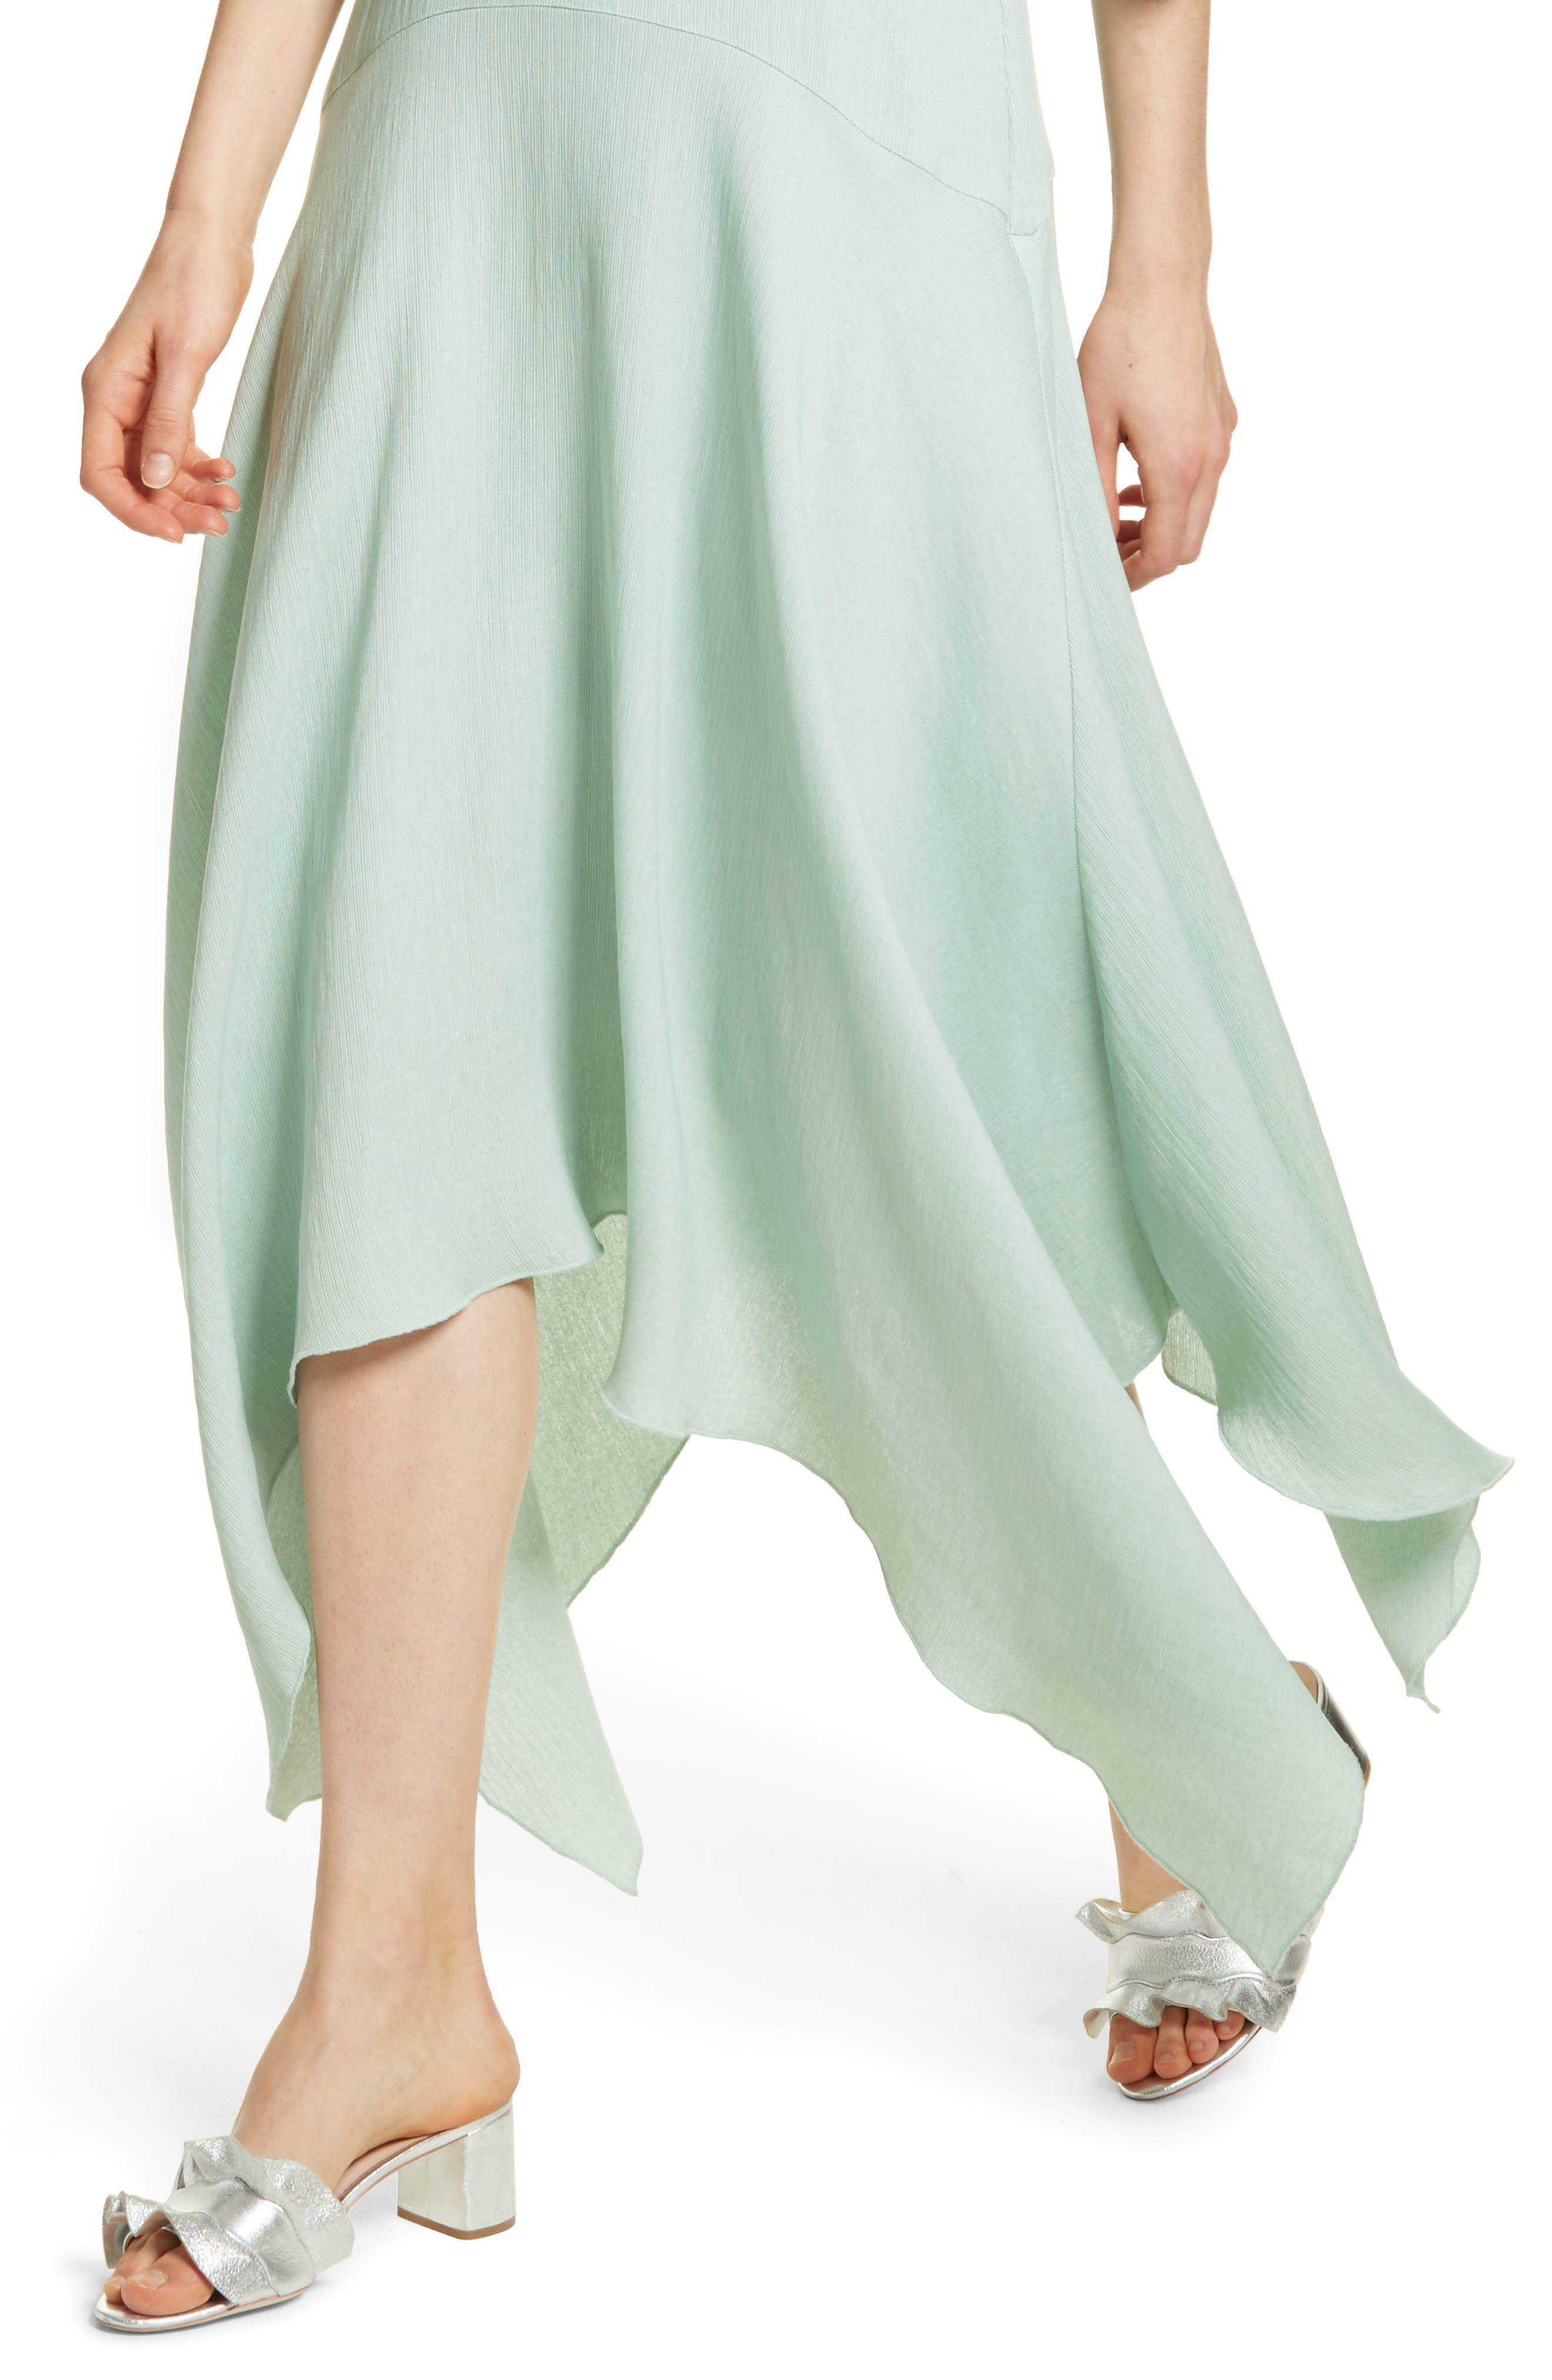 Prose & Poetry Vivianna Drop Waist Midi Dress,                             Alternate thumbnail 4, color,                             332